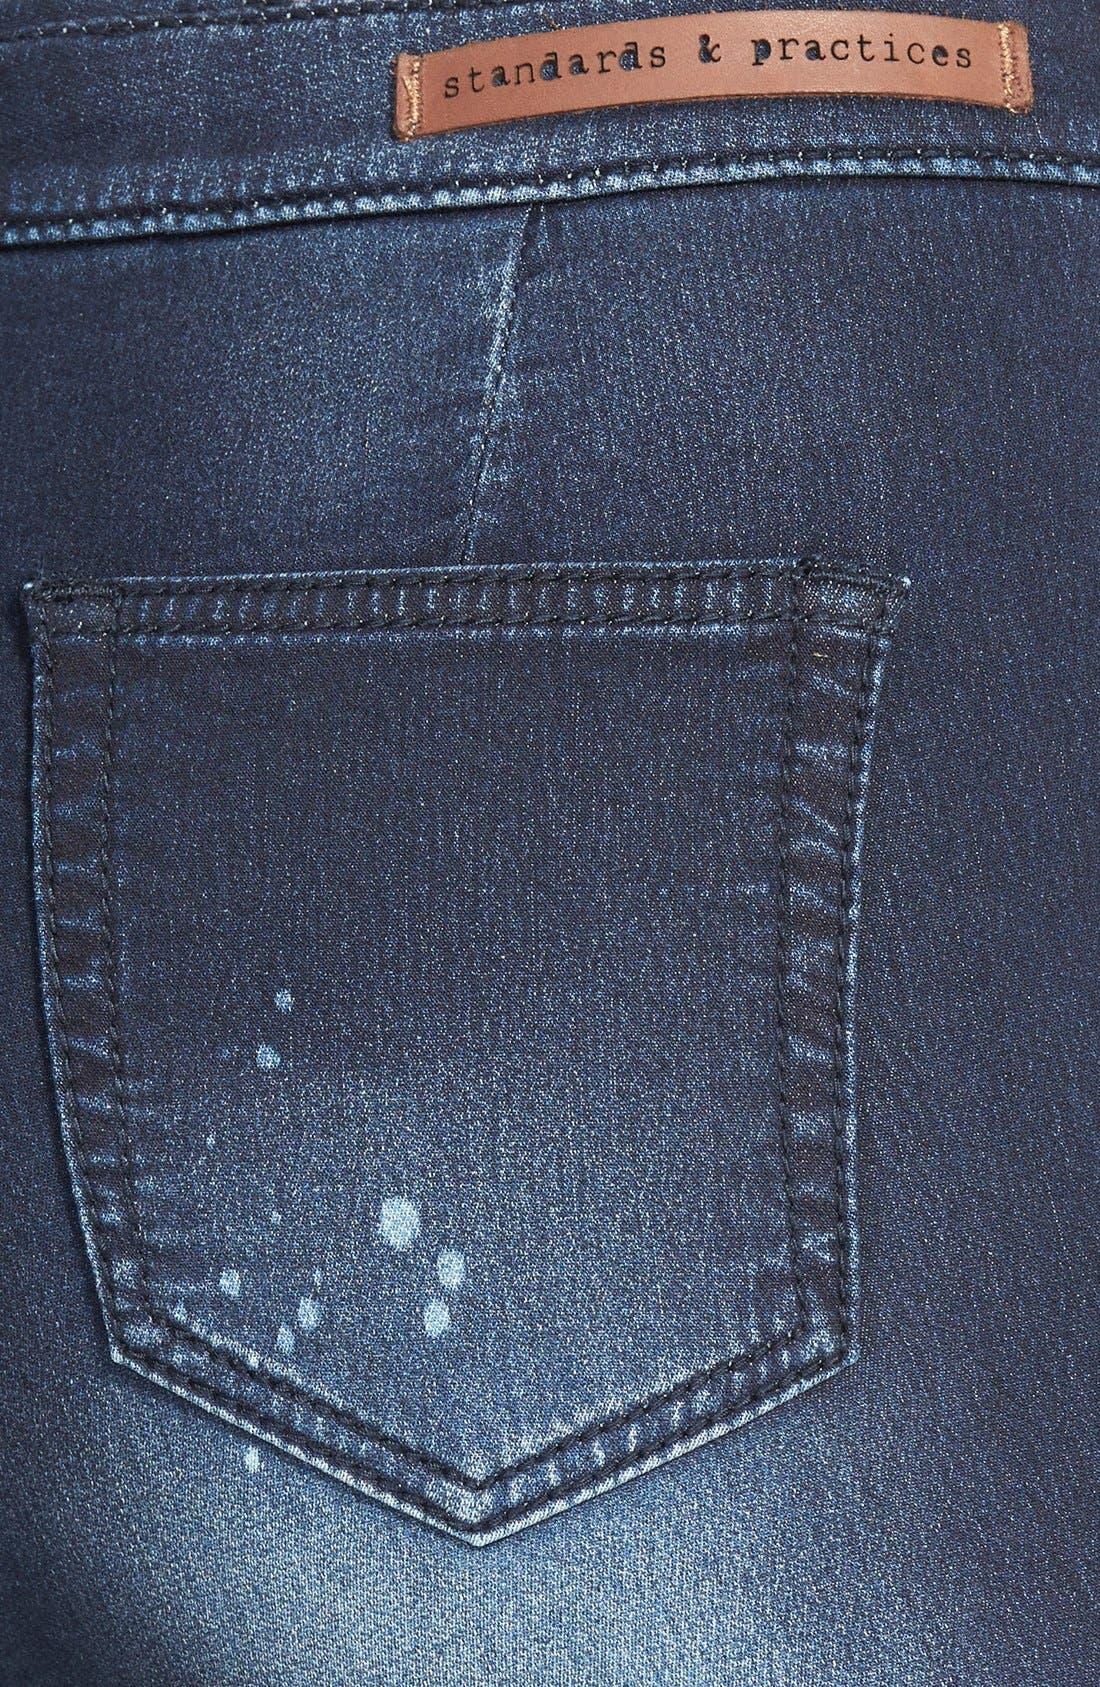 Alternate Image 3  - Standards & Practices Destroyed High Waist Skinny Jeans (Paint Splatter)